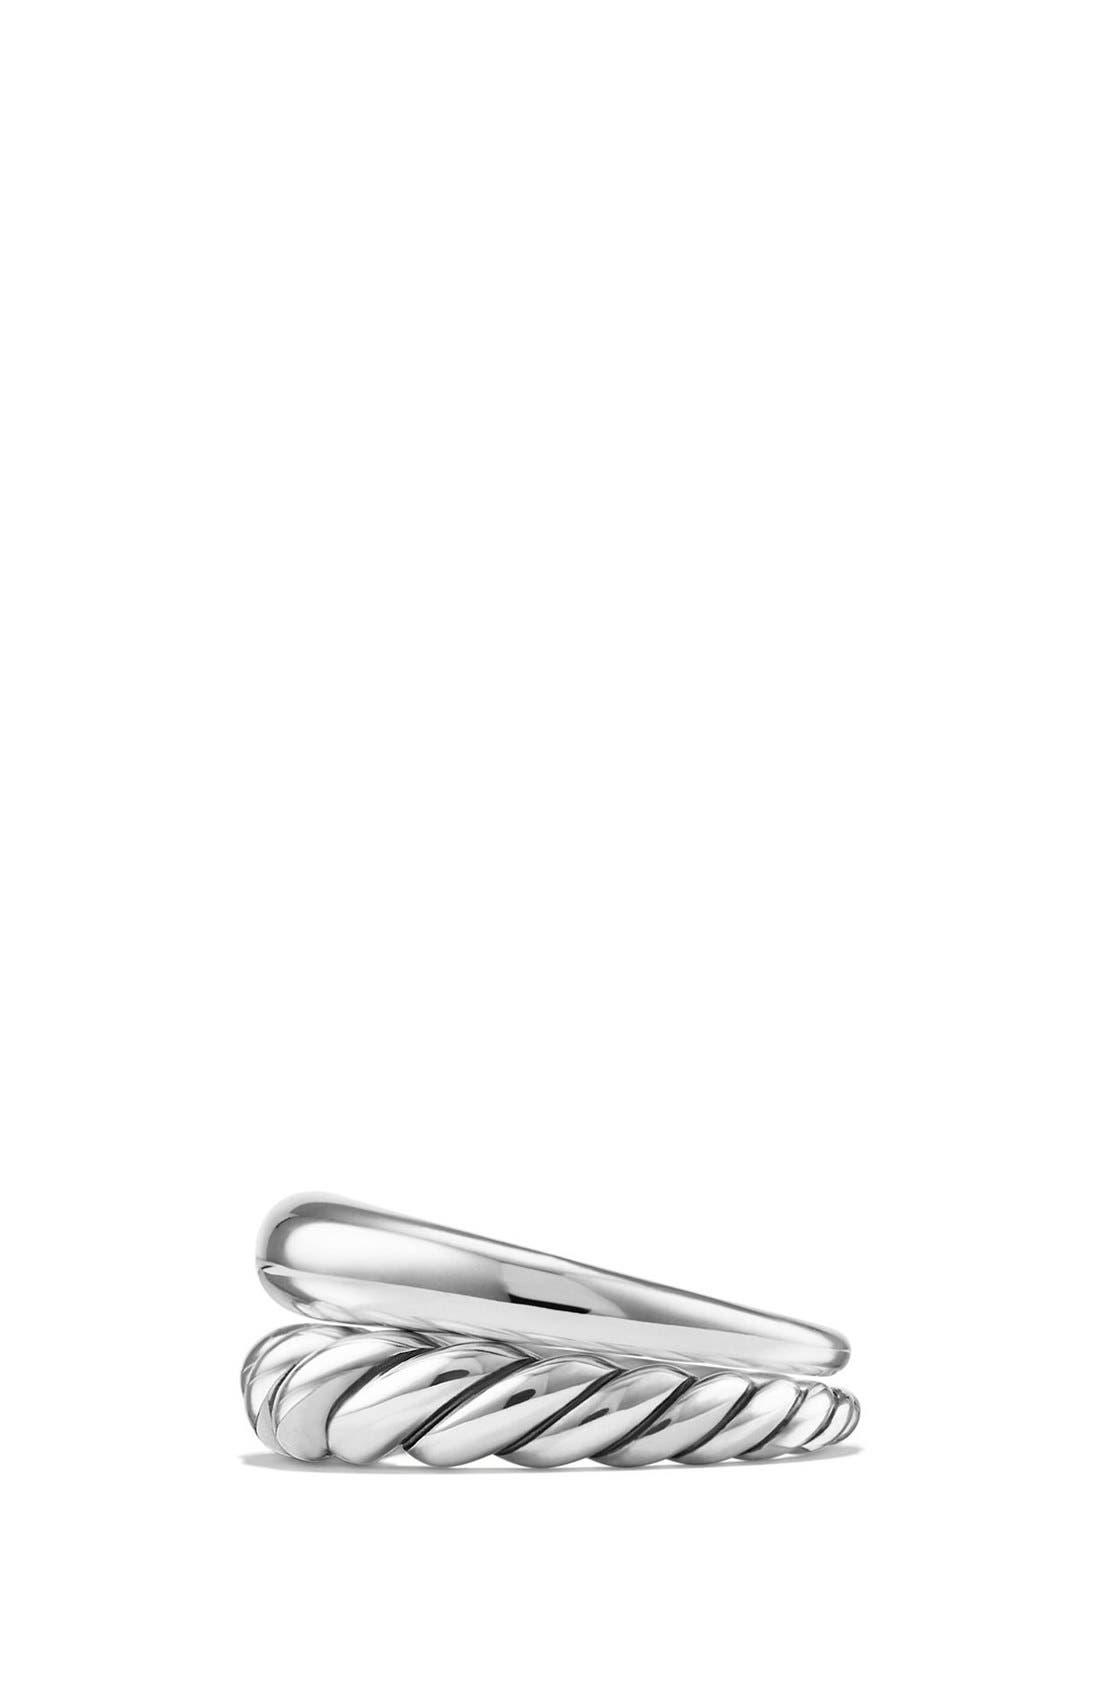 Alternate Image 3  - David Yurman 'Pure Form' Sterling Silver Stacking Rings (Set of 2)